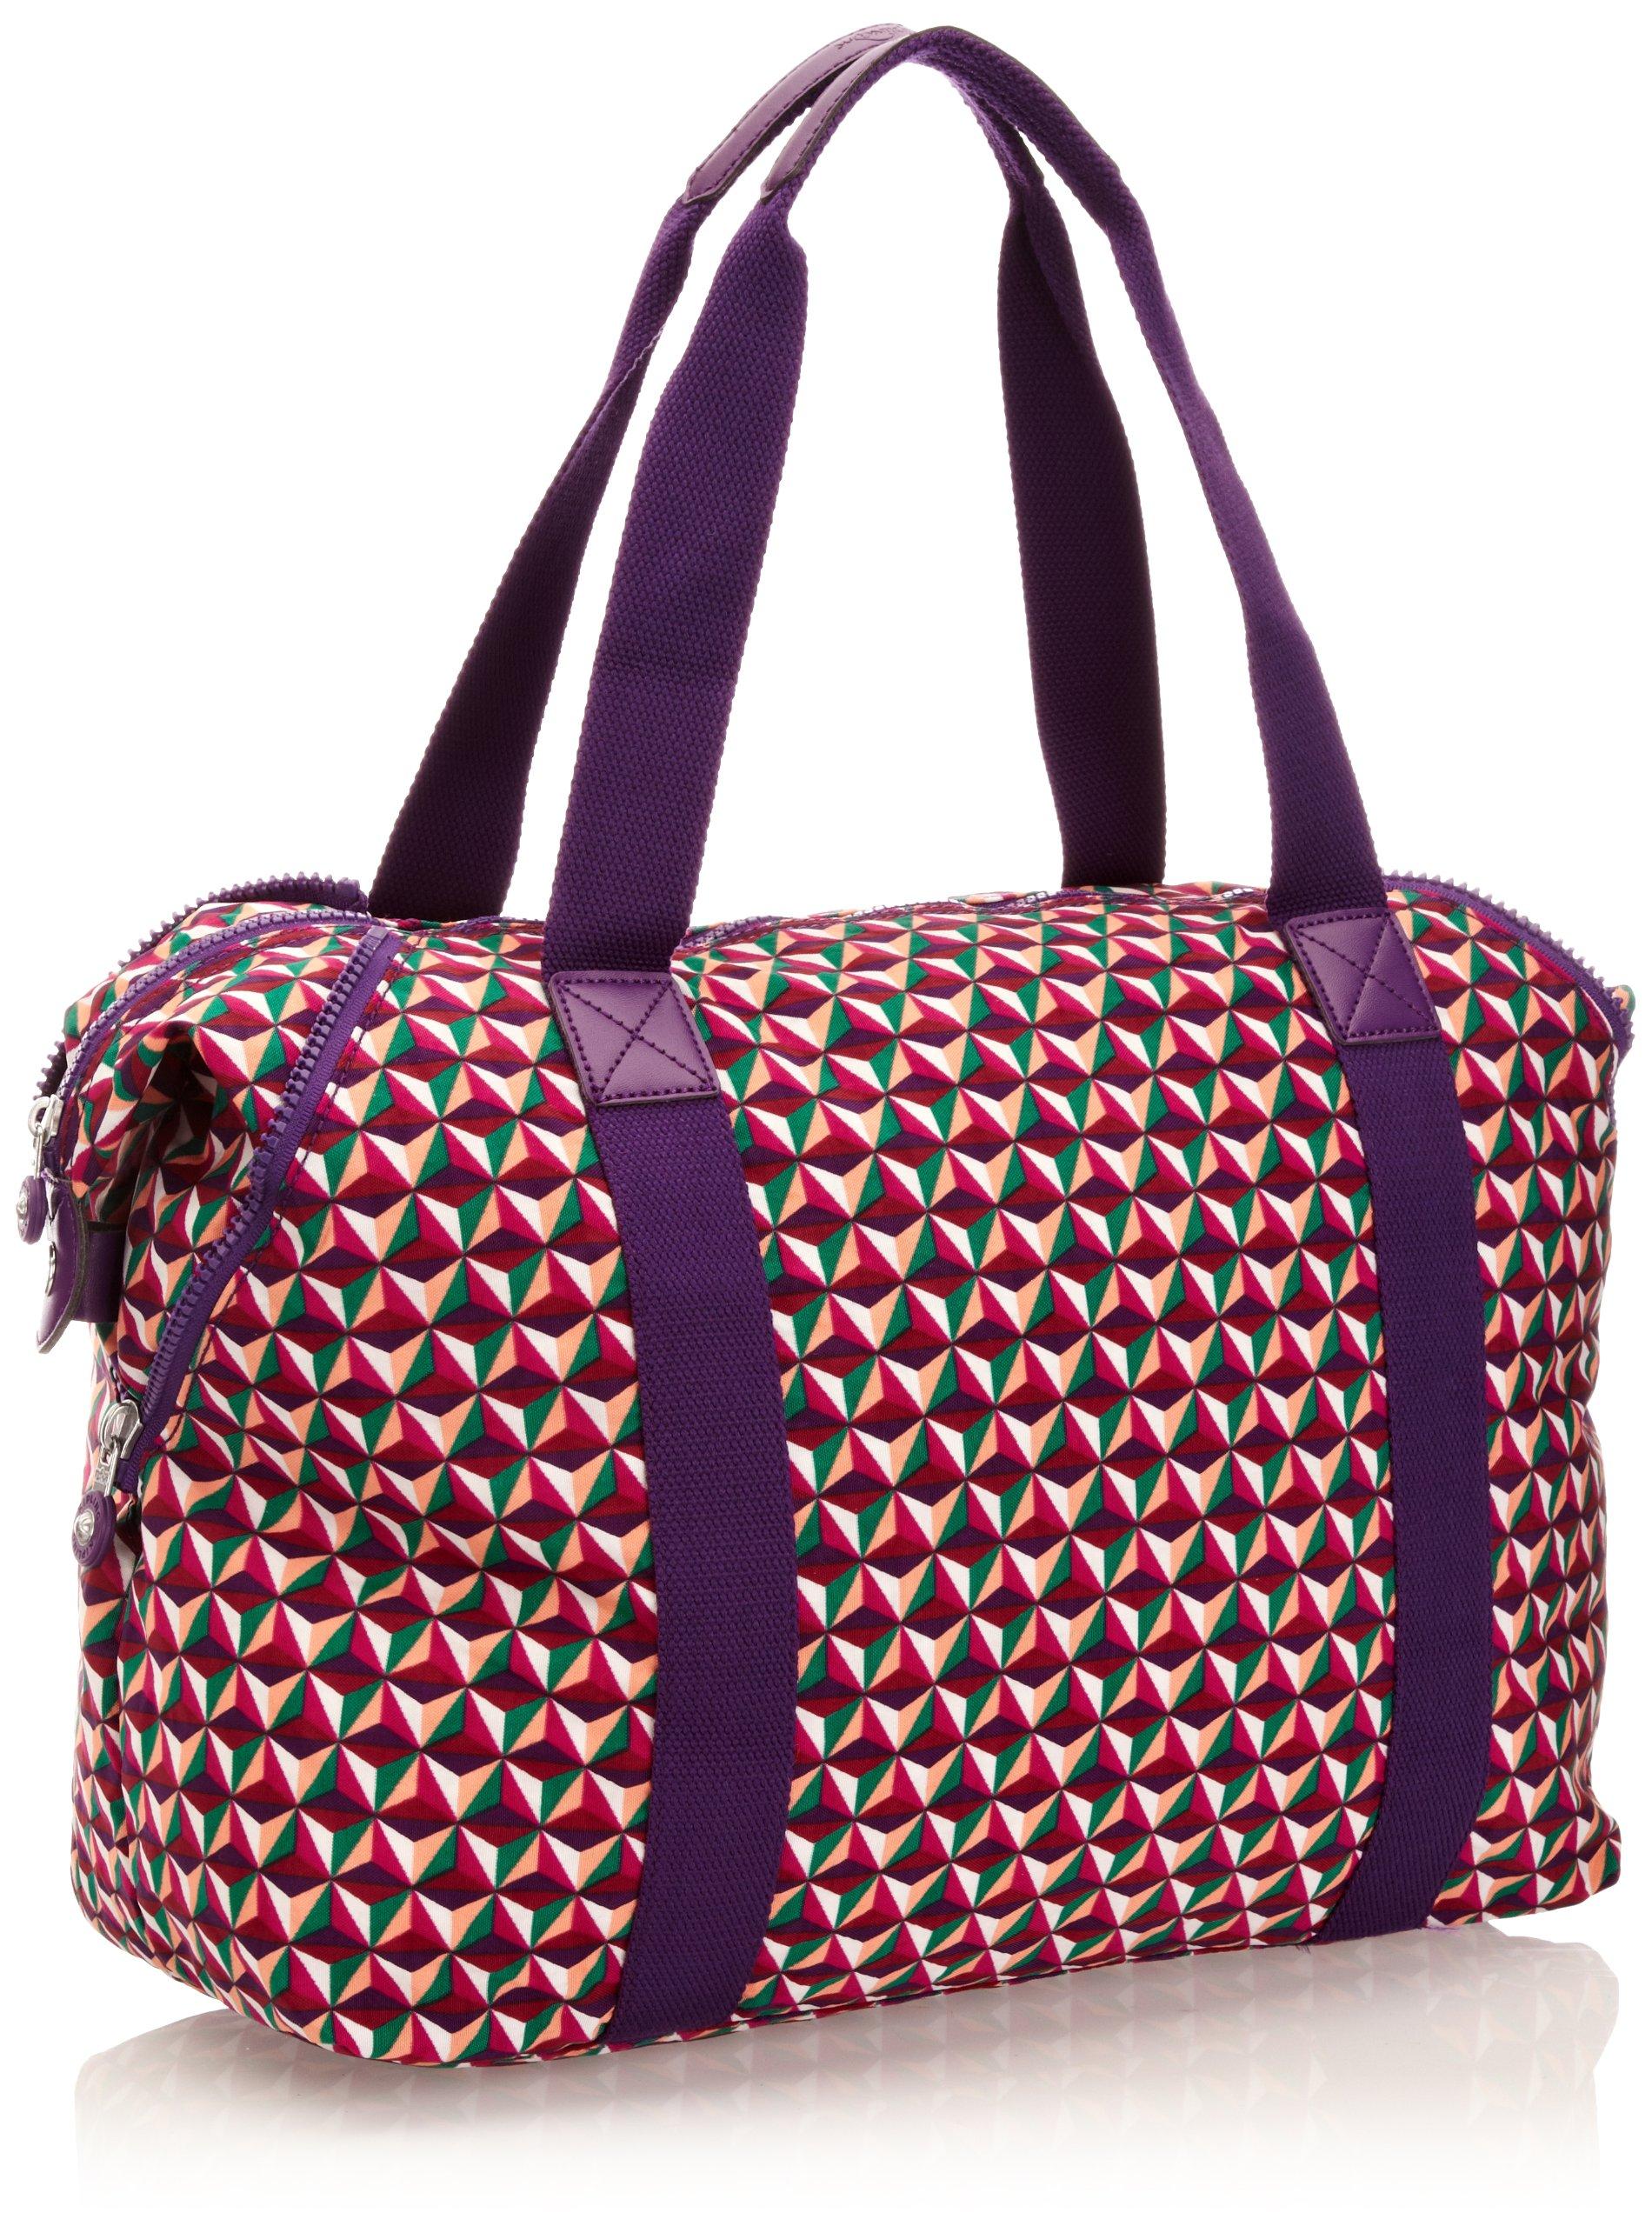 e16e75e939 Kipling Art M Medium Travel Tote Bag • AMC TOP DEALS